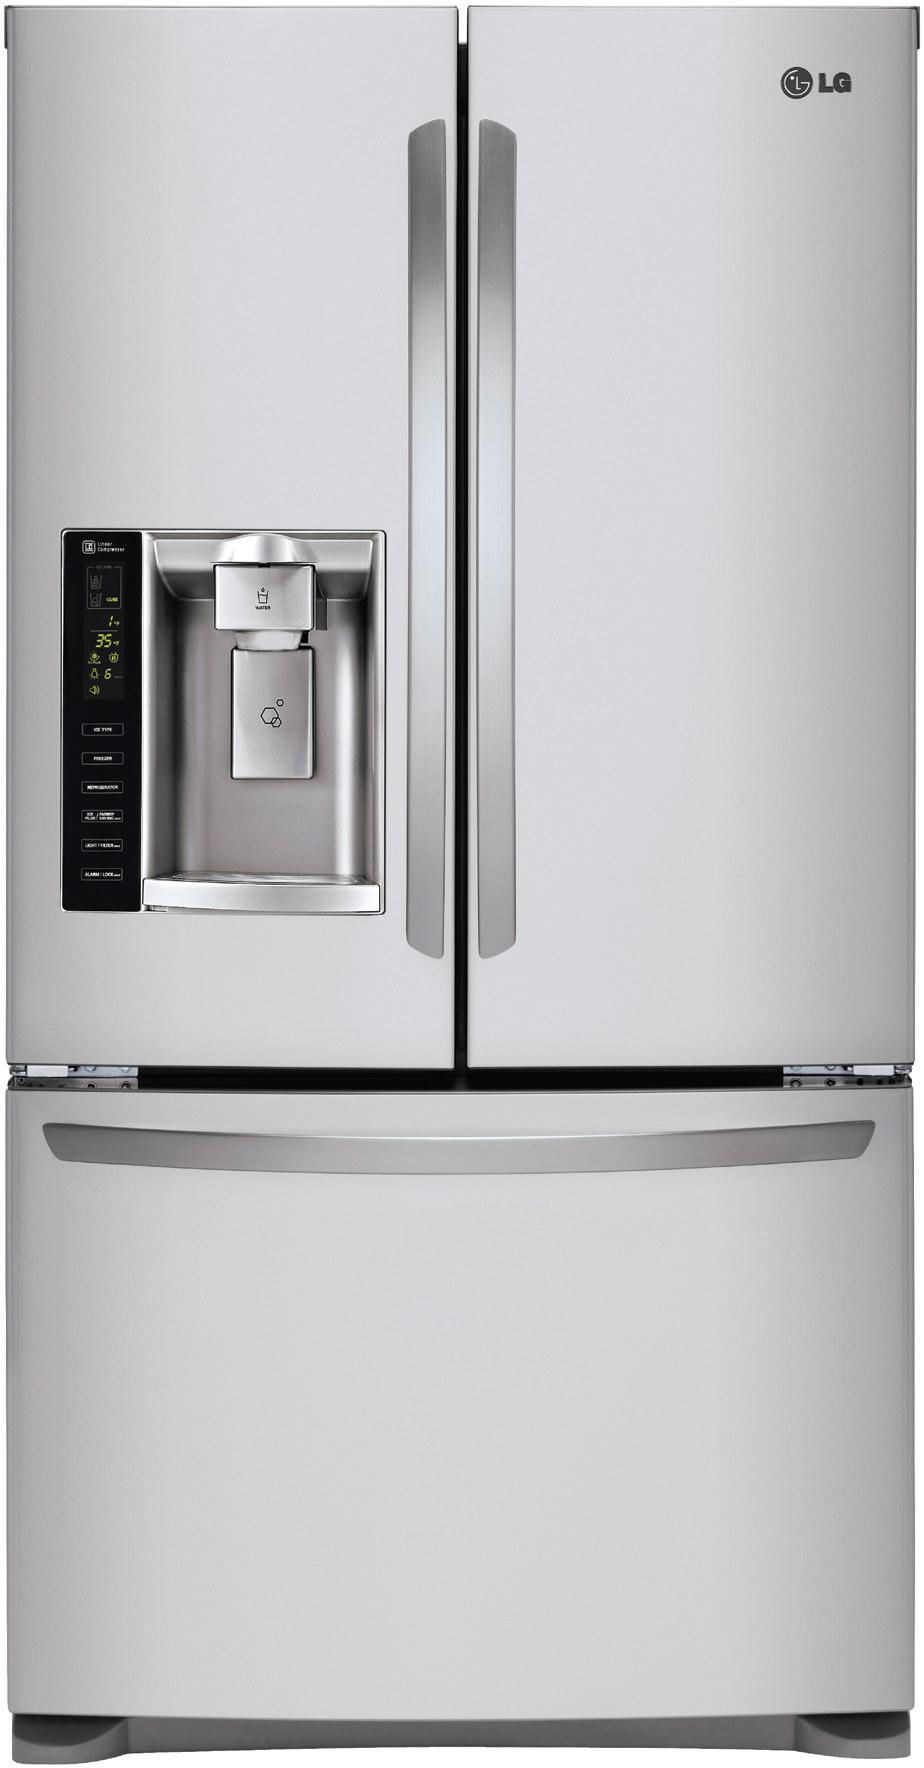 LG Appliances French Door Refrigerators 24.7 Cu. Ft. French Door Refrigerator - Item Number: LFX25973ST